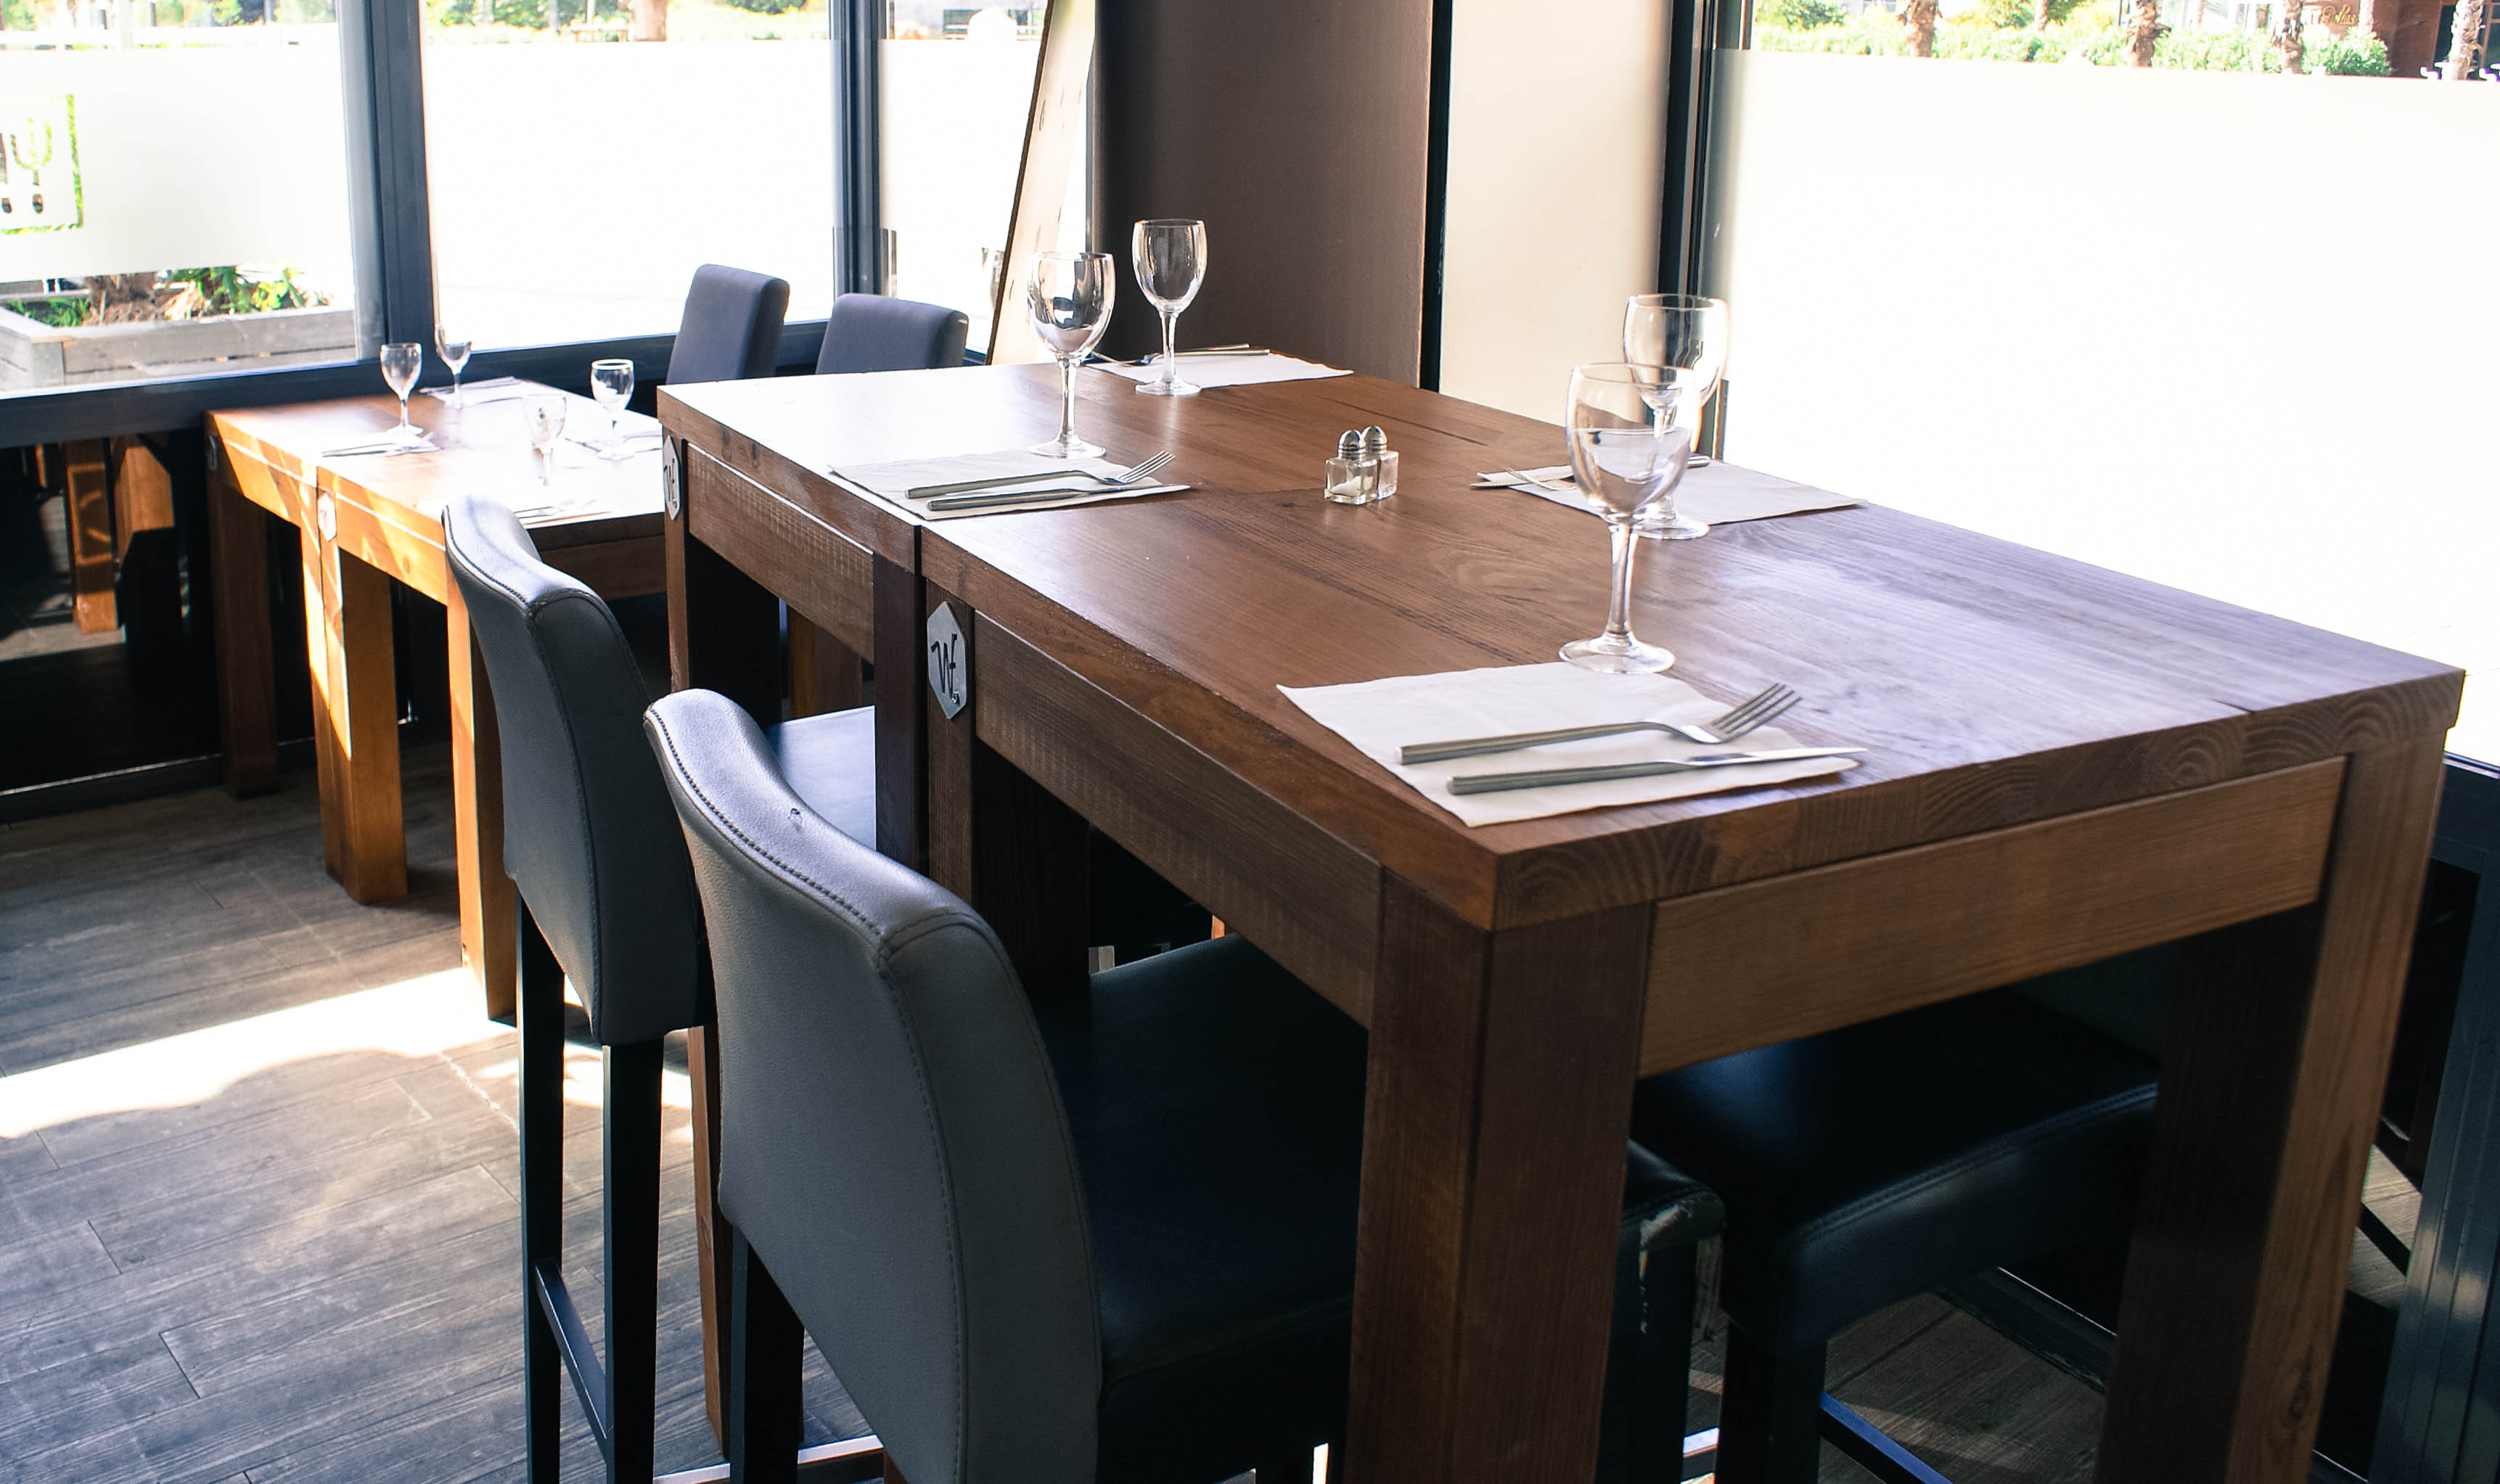 Tables int Le comptoir7